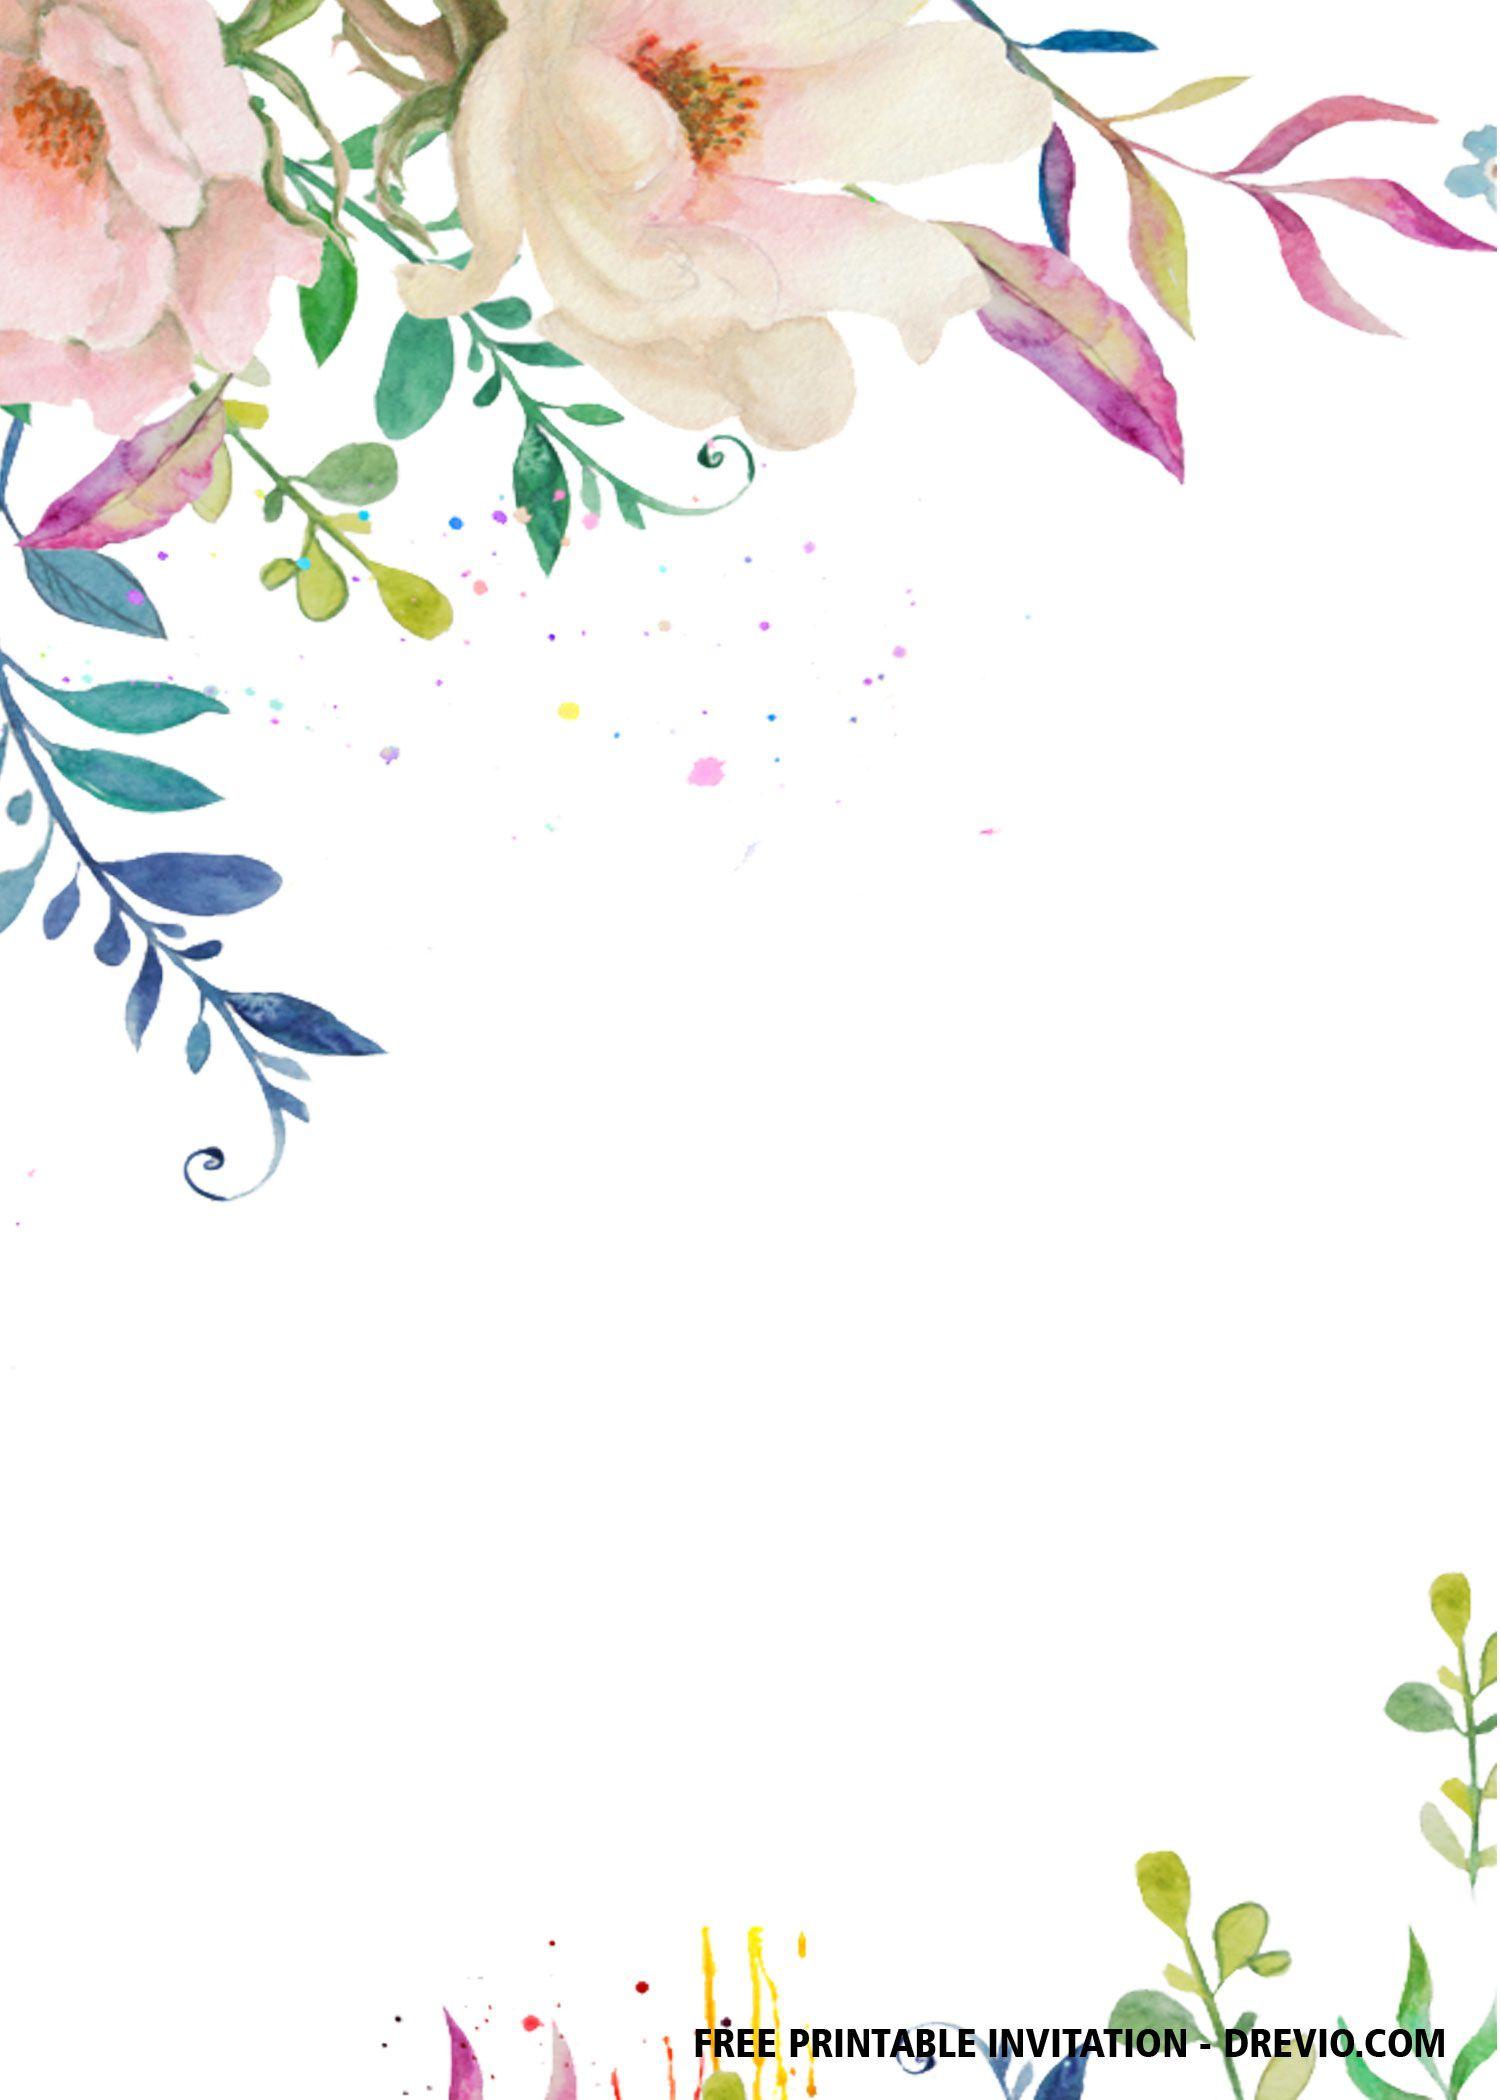 007 Best Free Bridal Shower Invite Template Highest Clarity  Invitation For Word Wedding MicrosoftFull